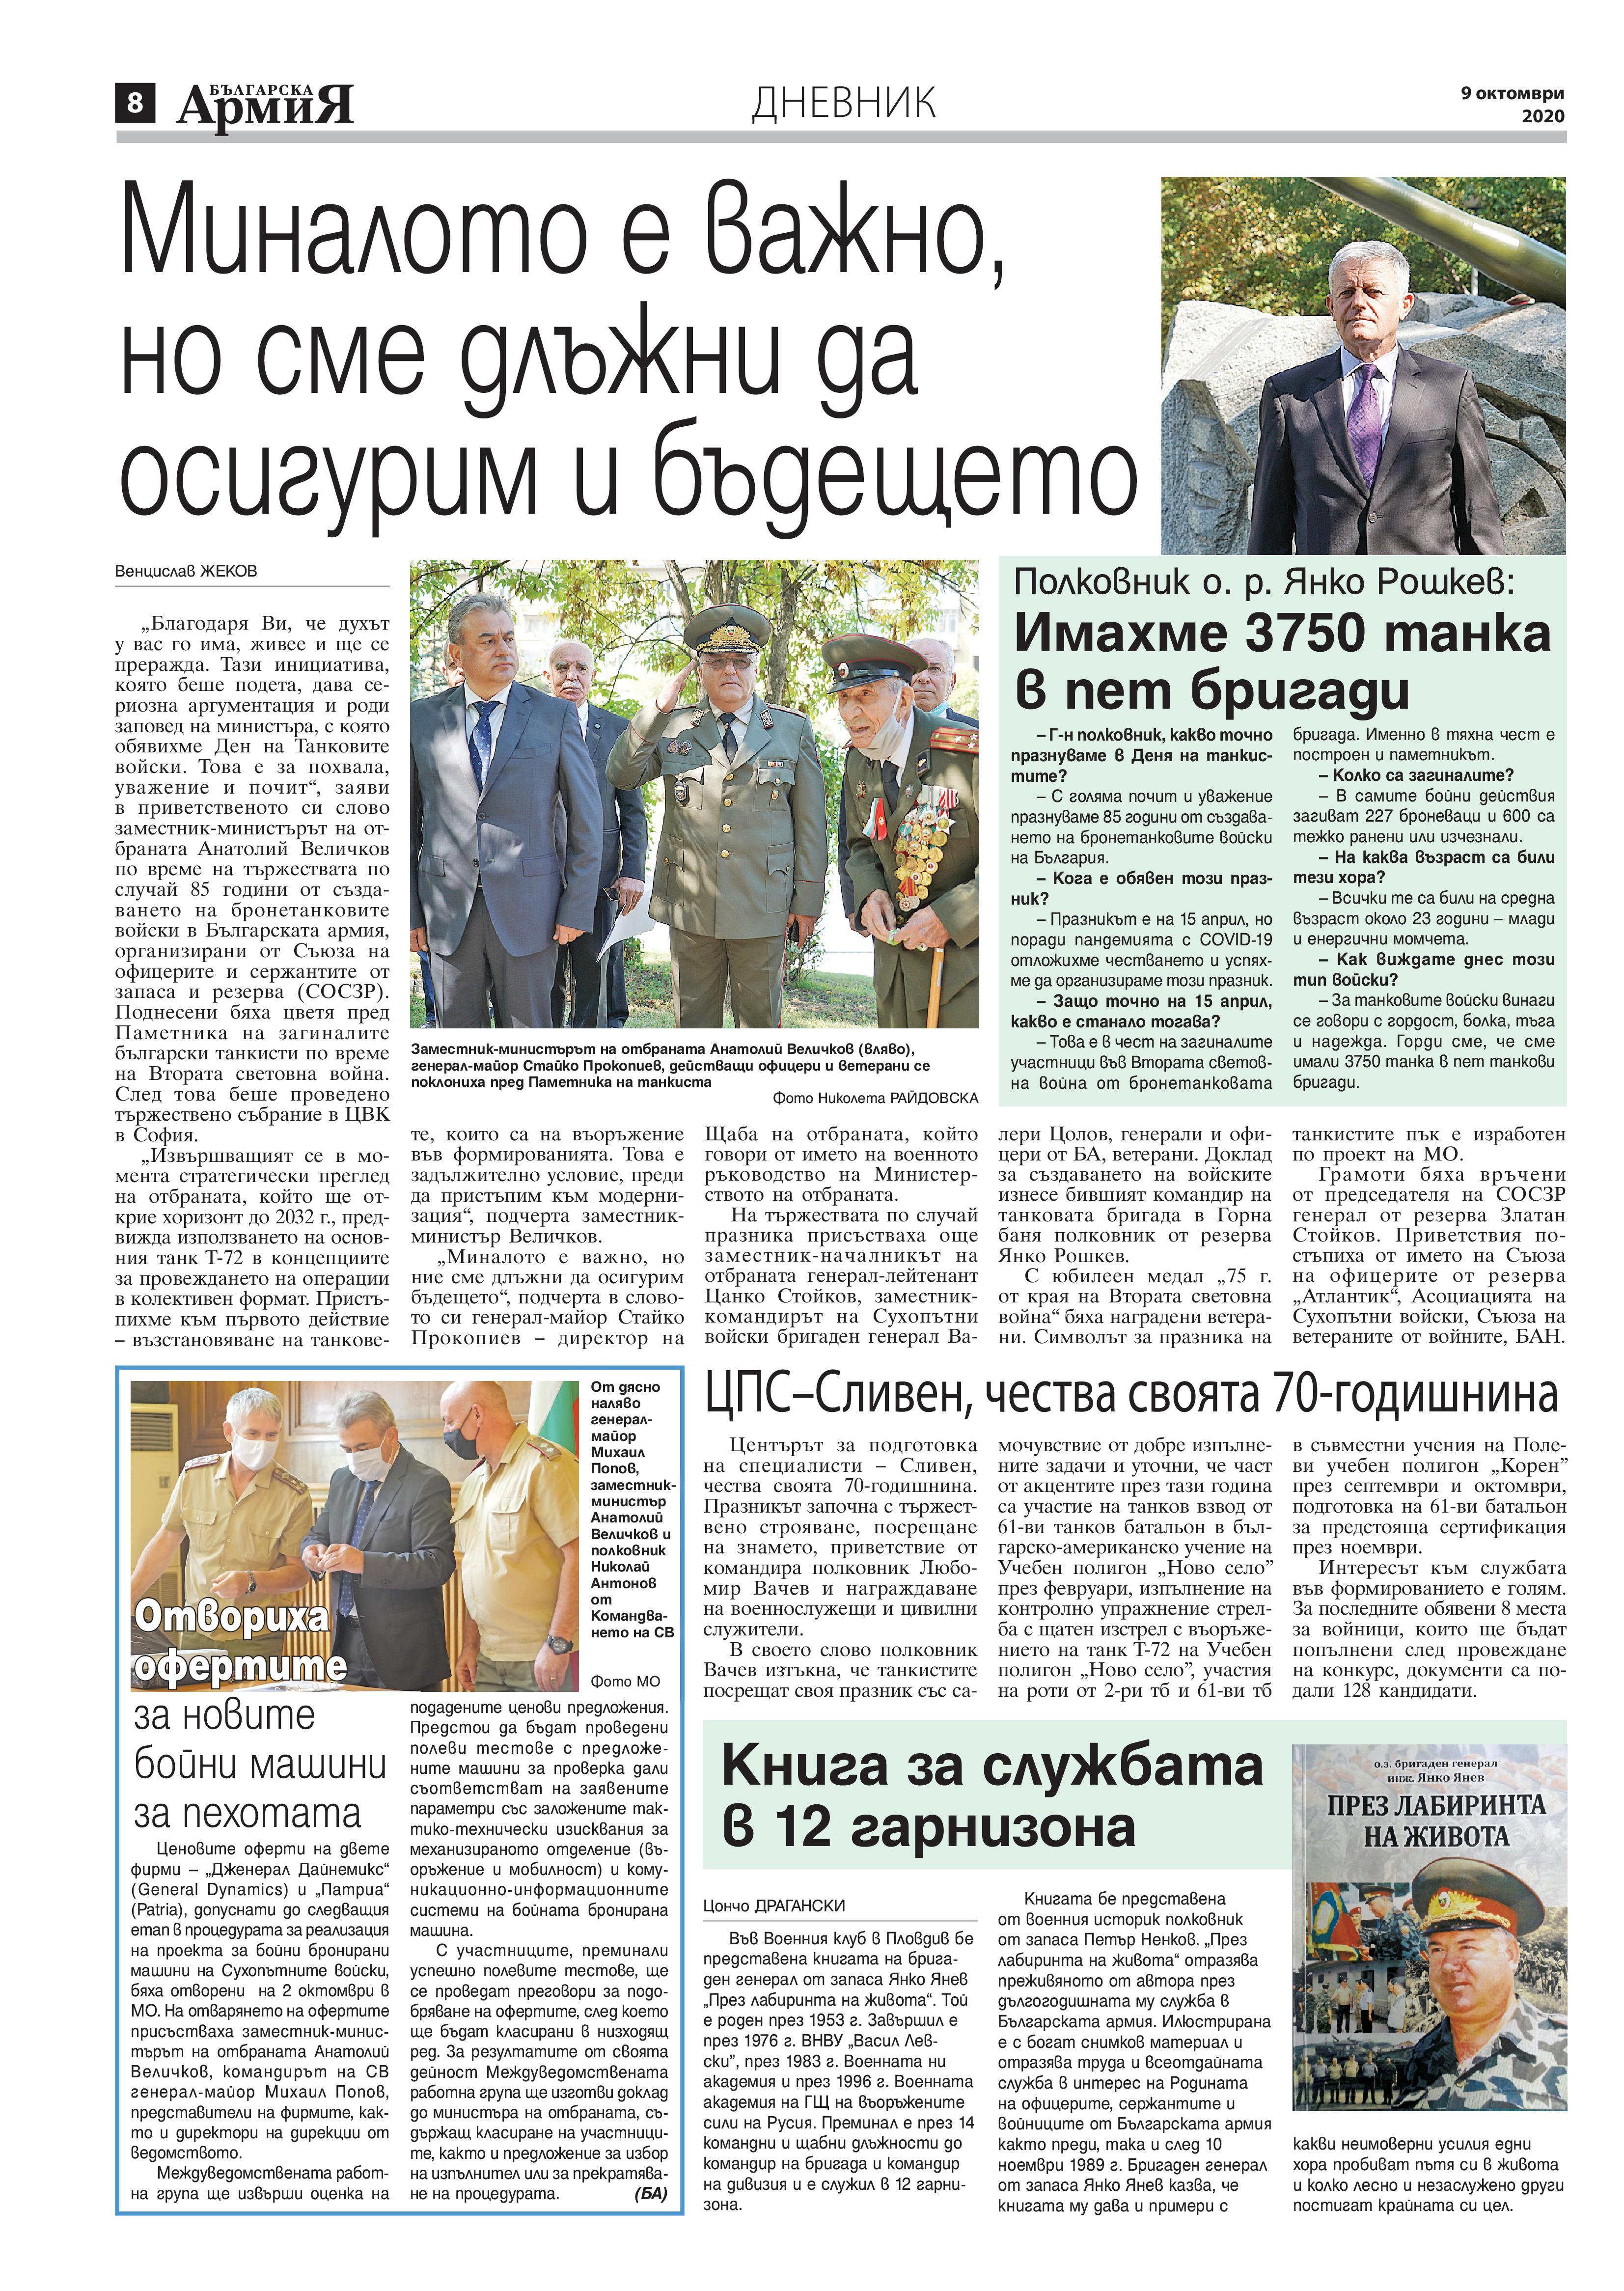 https://armymedia.bg/wp-content/uploads/2015/06/08-42.jpg